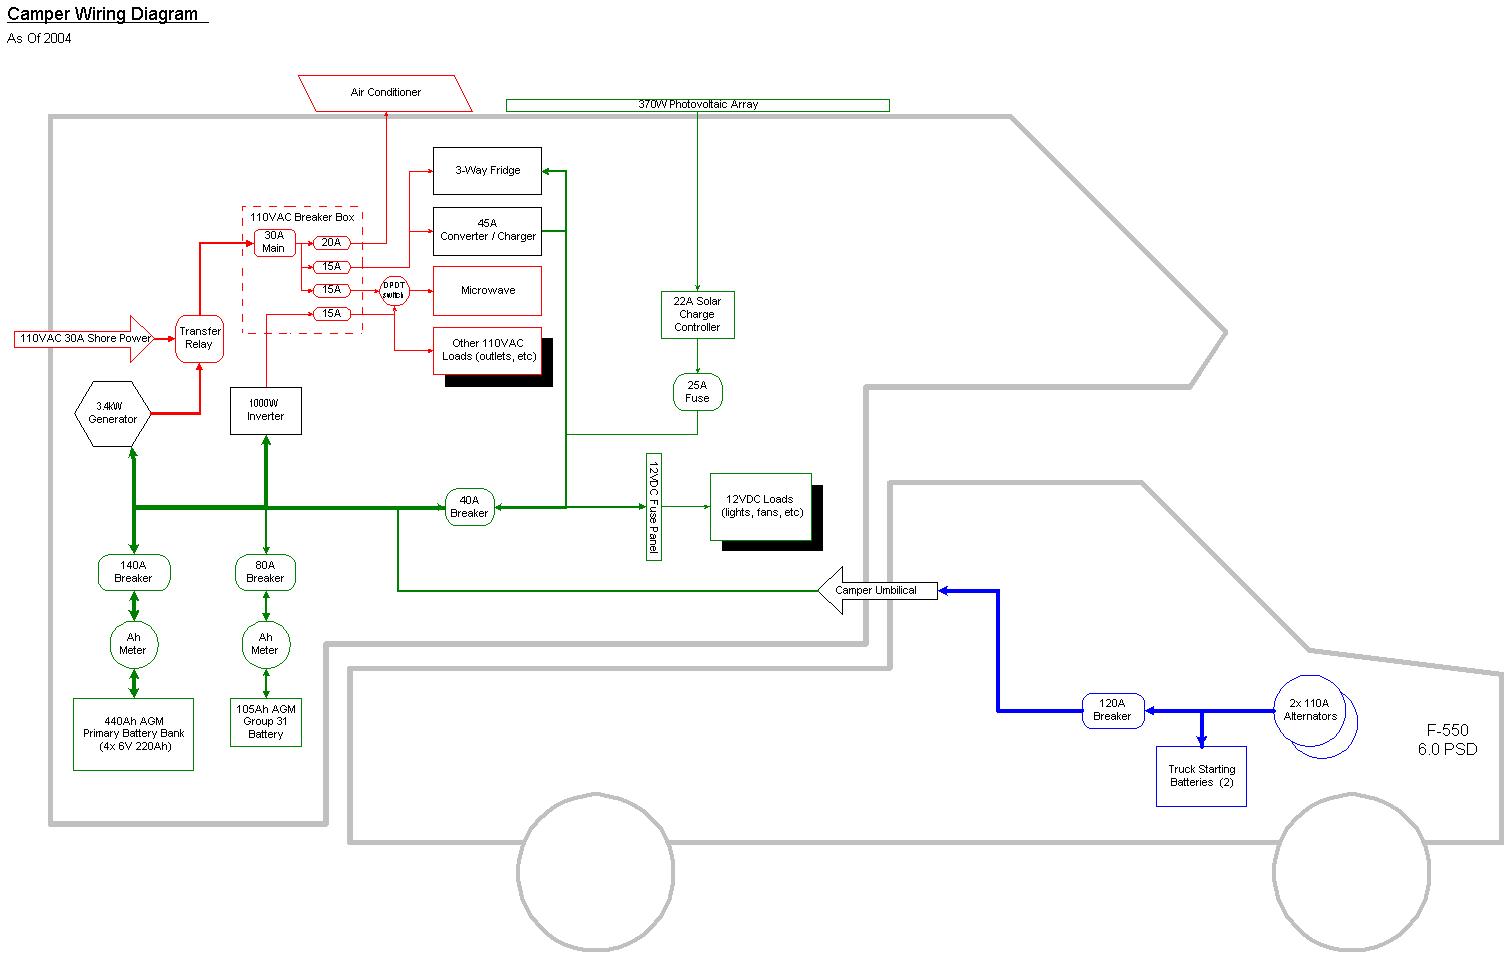 2004 Camper Wiring Diagram At Rv Electrical - Wiring Diagrams - Camper Electrical Wiring Diagram